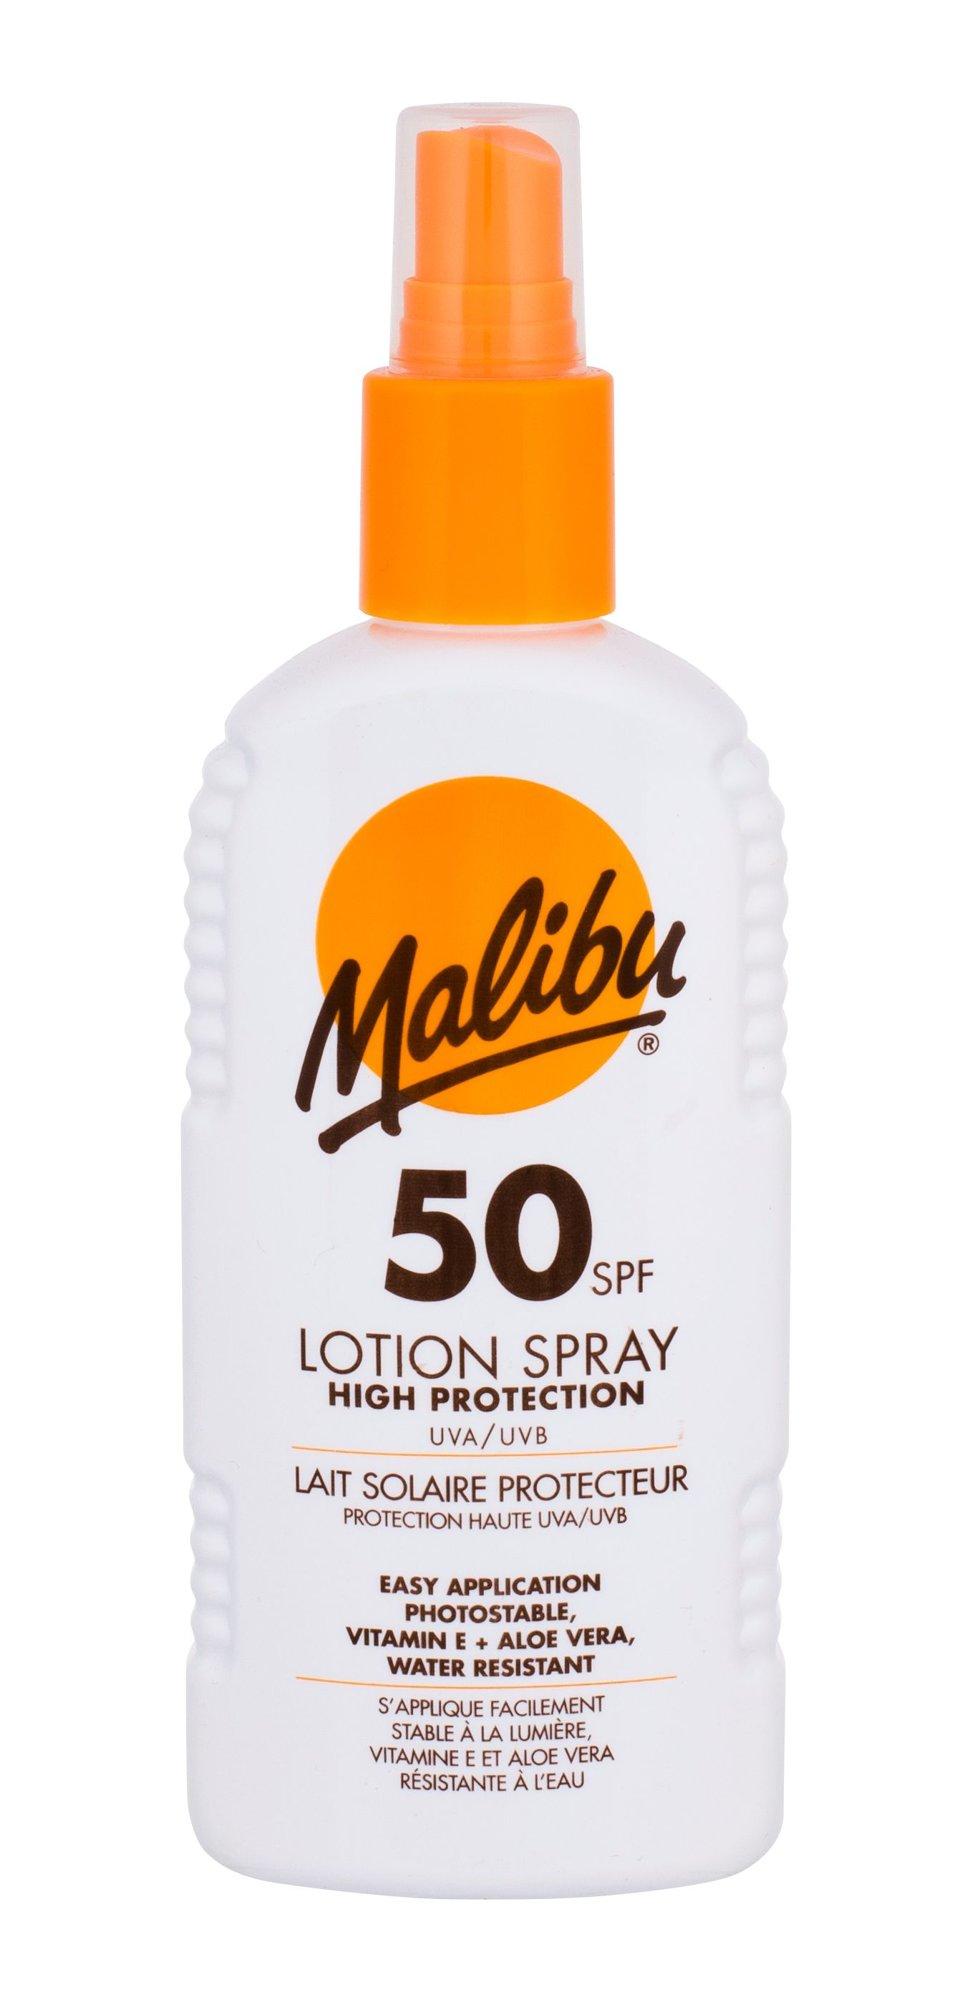 Malibu Lotion Spray SPF50